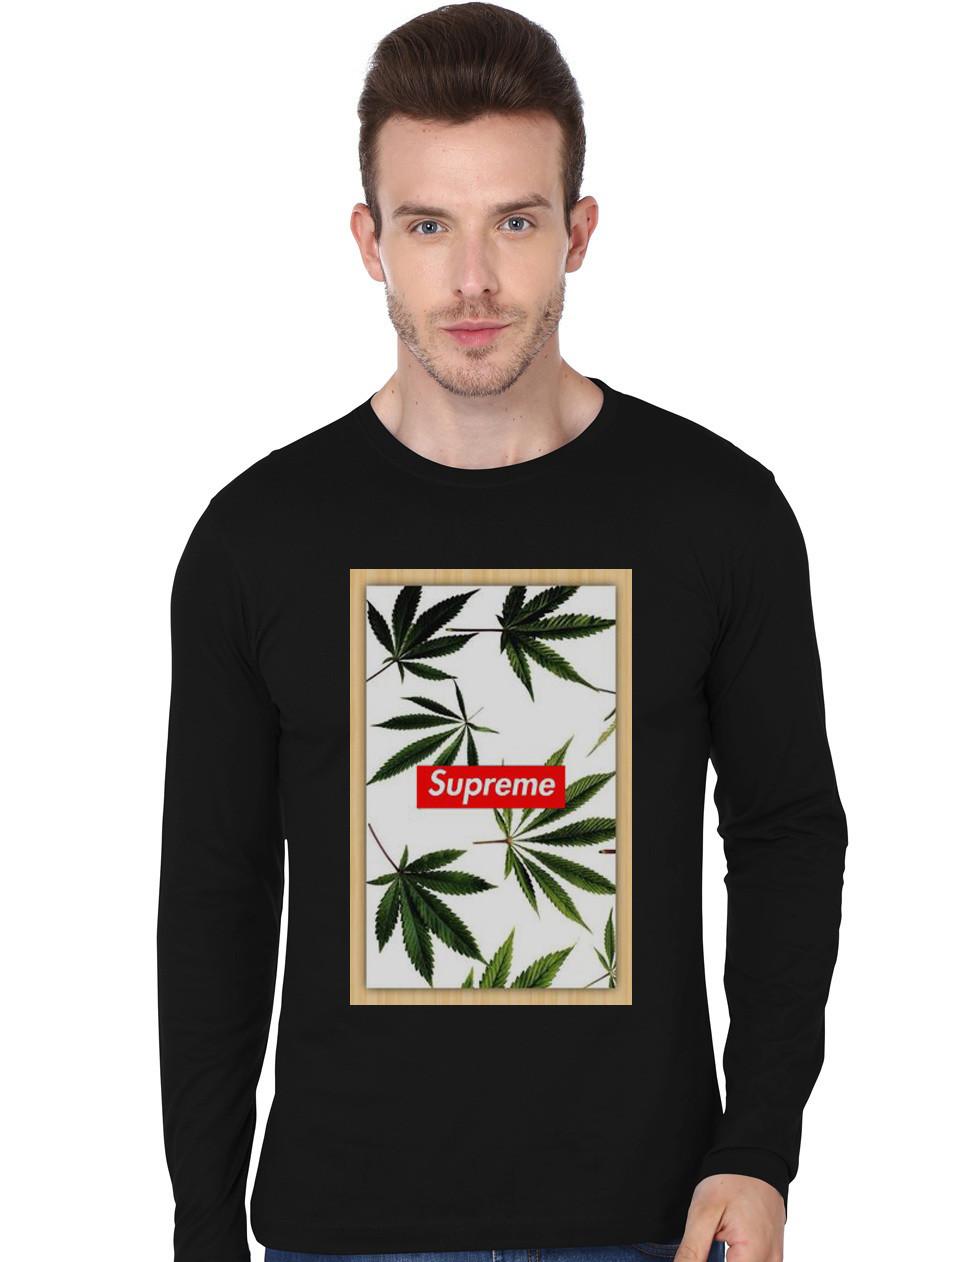 Black t shirt supreme - Supreme Black Full Sleeve T Shirt